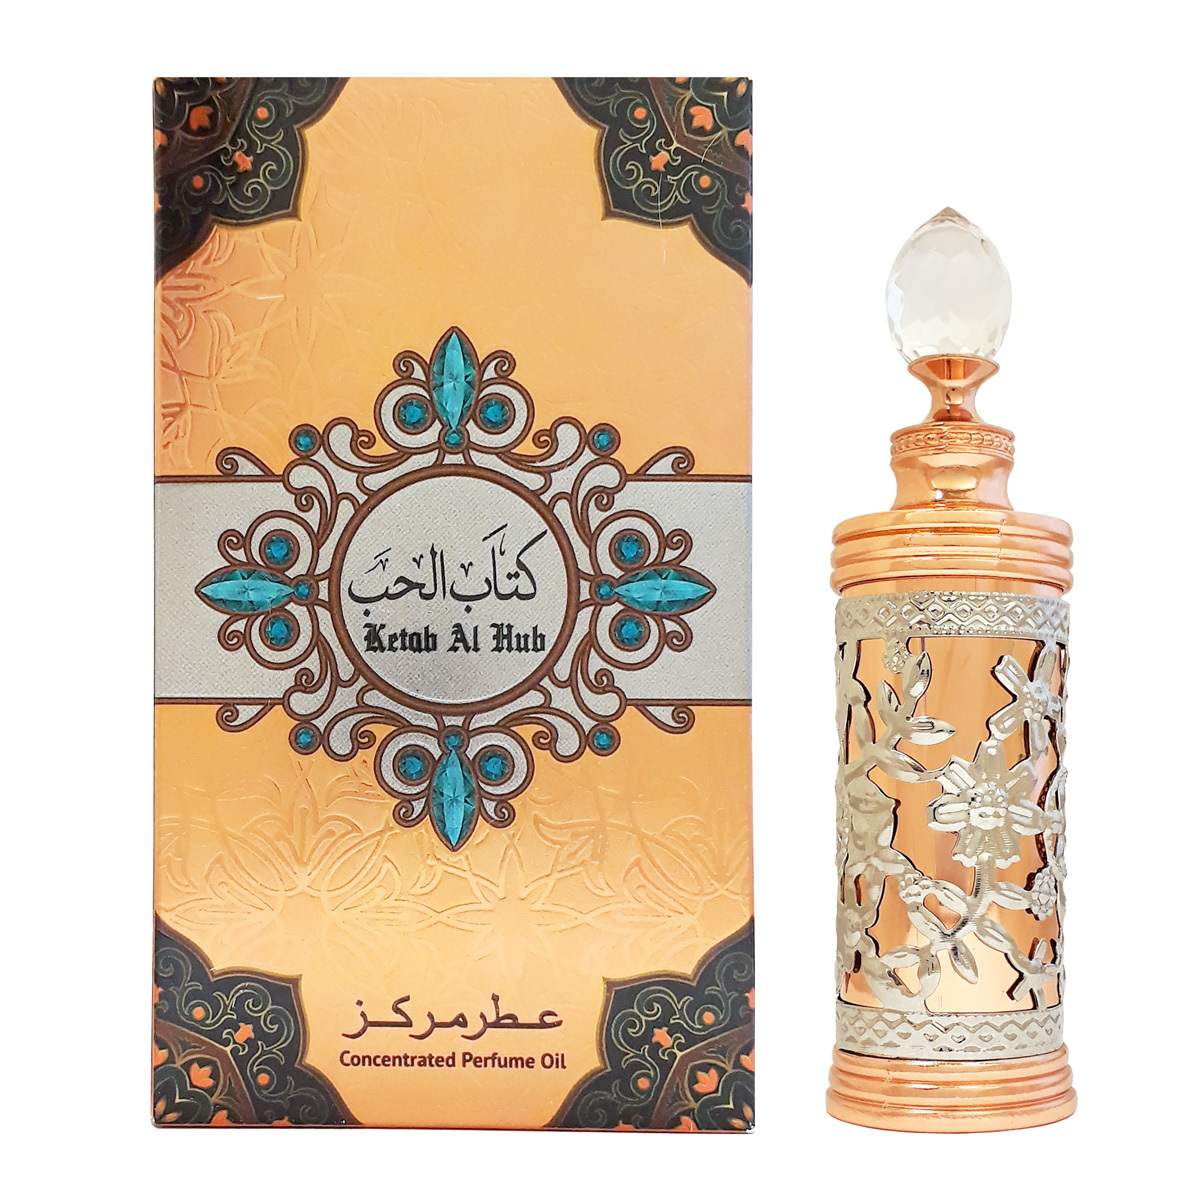 Пробник для Ketab al Hub  Кетаб аль Хуб 1 мл арабские масляные духи от Халис Khalis Perfumes